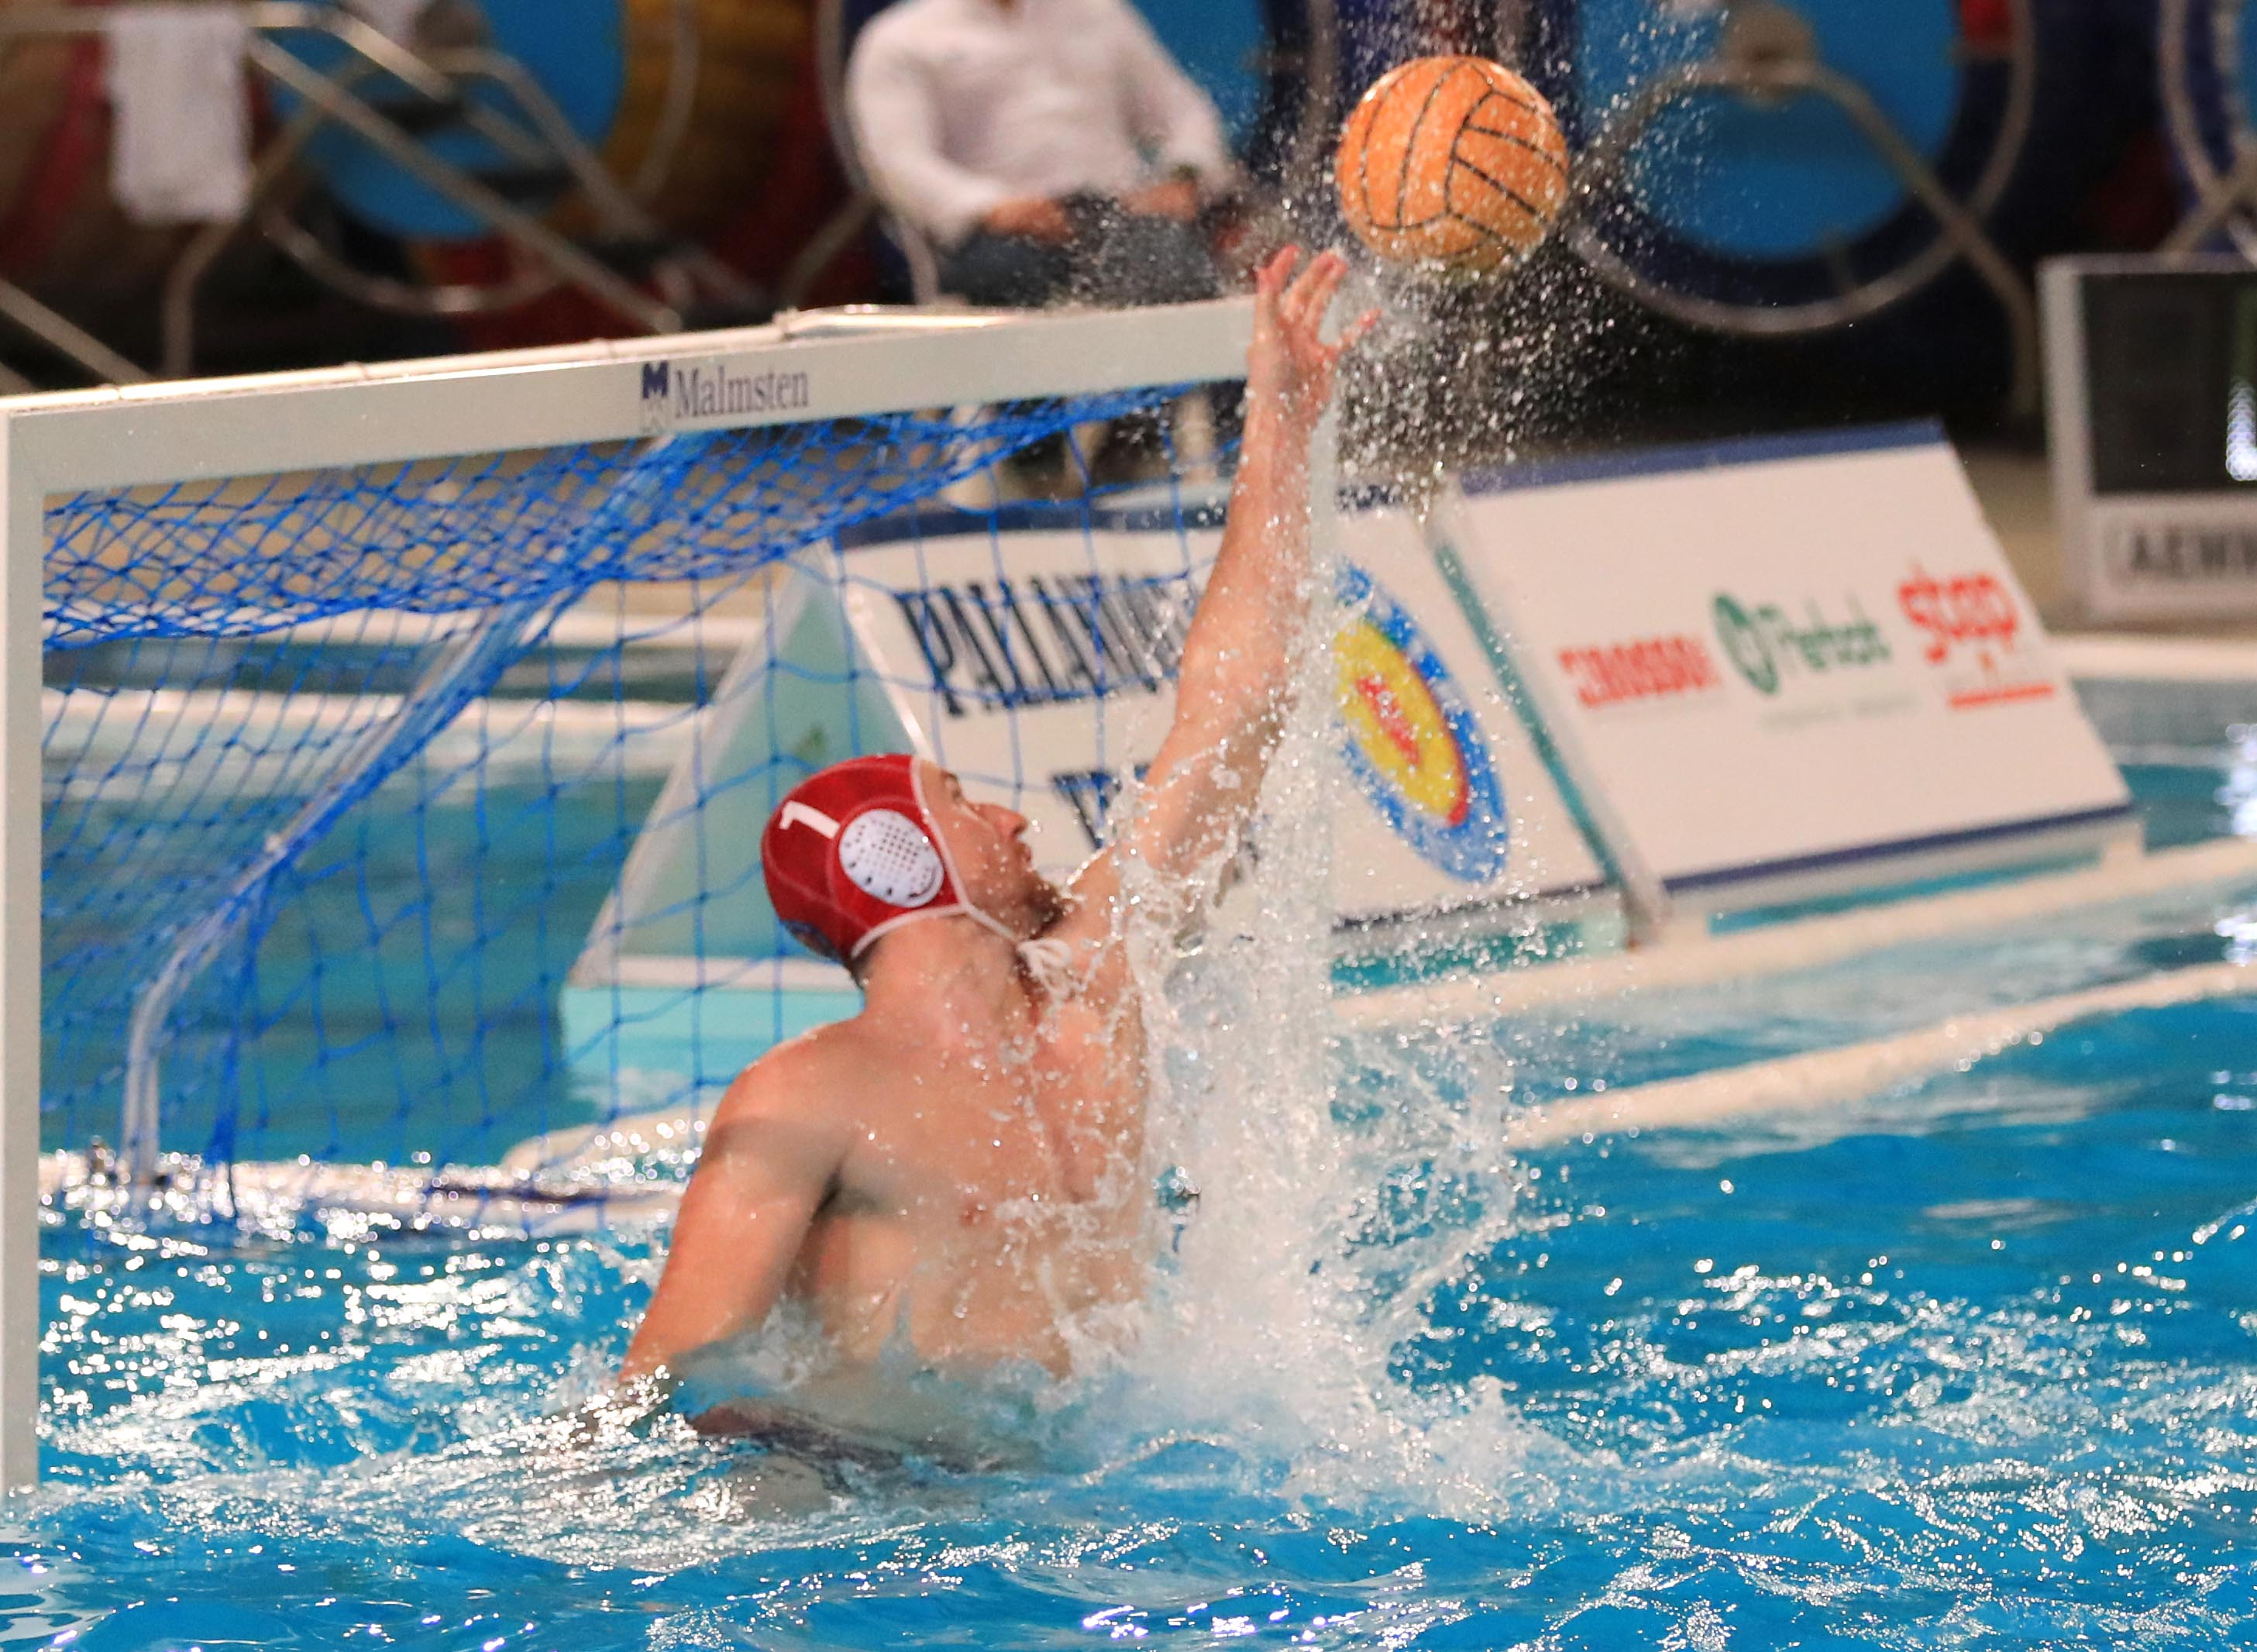 Terza gara di Coppa Italia, Trieste battuta anche dal Telimar (3-8)